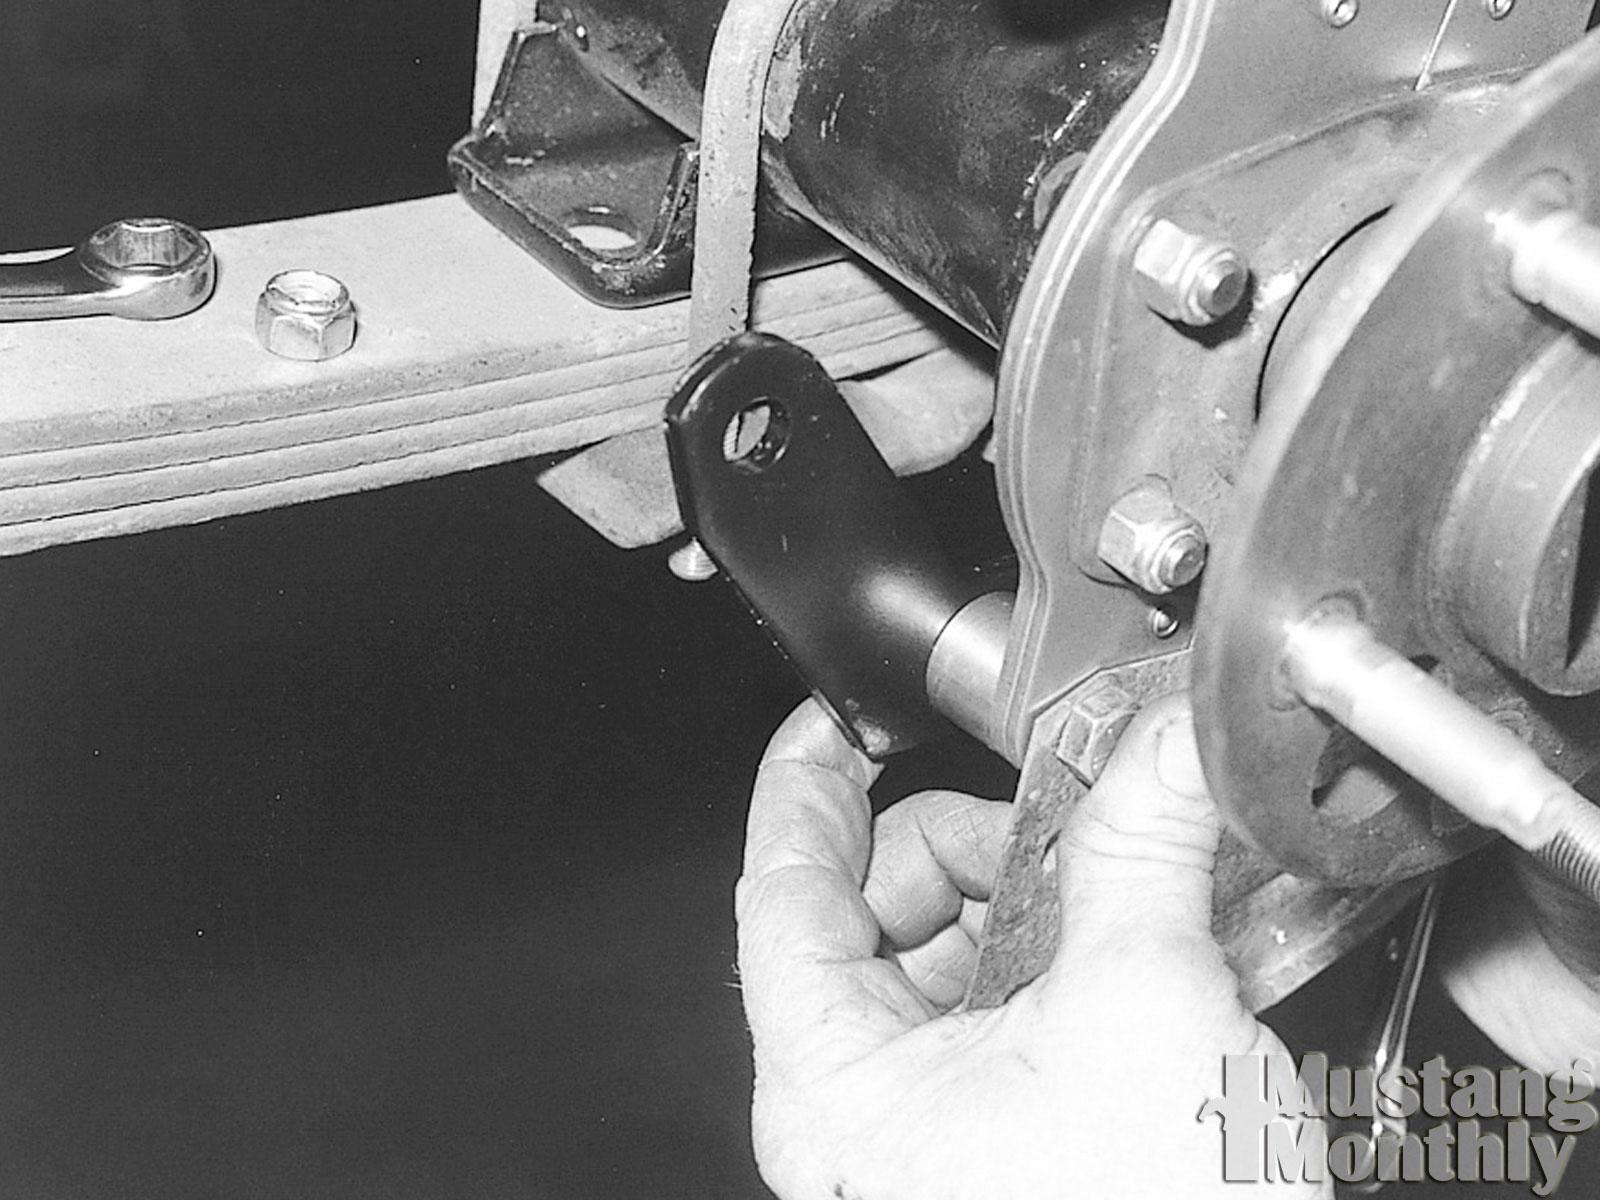 Mump 0311 10  Install Rear Disc Brakes  Calipeer Spacers